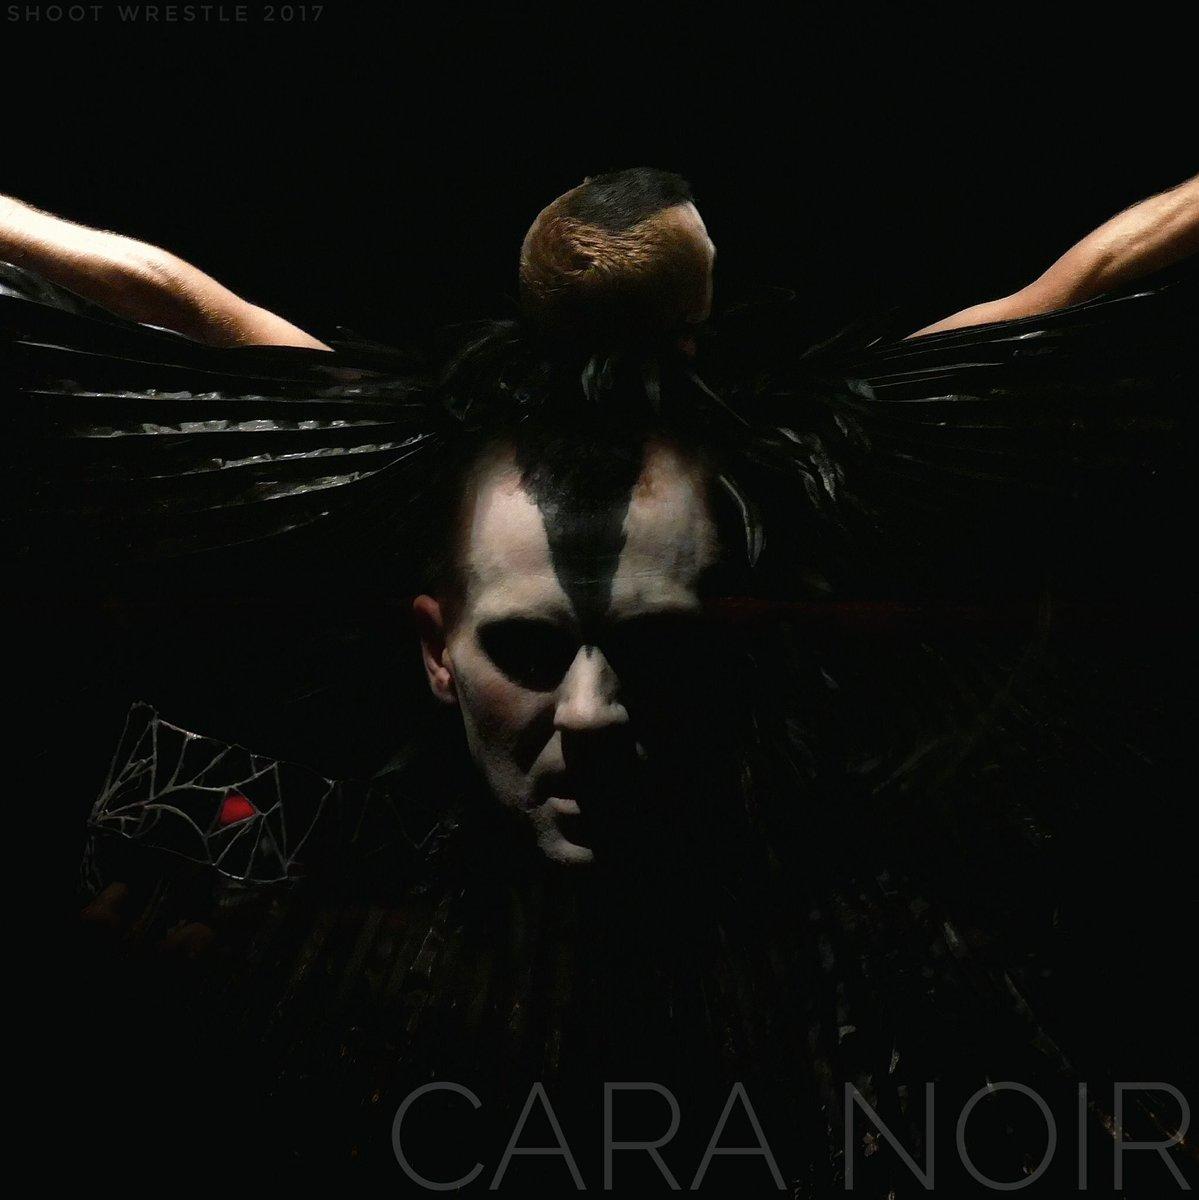 My new album art @shoot.wrestle @revprouk #blackswan #primadonna #ballet #tchiakovsky #performanceartist #wrestling #lucha #プロレス #lipstick<br>http://pic.twitter.com/6zWD3kzghW